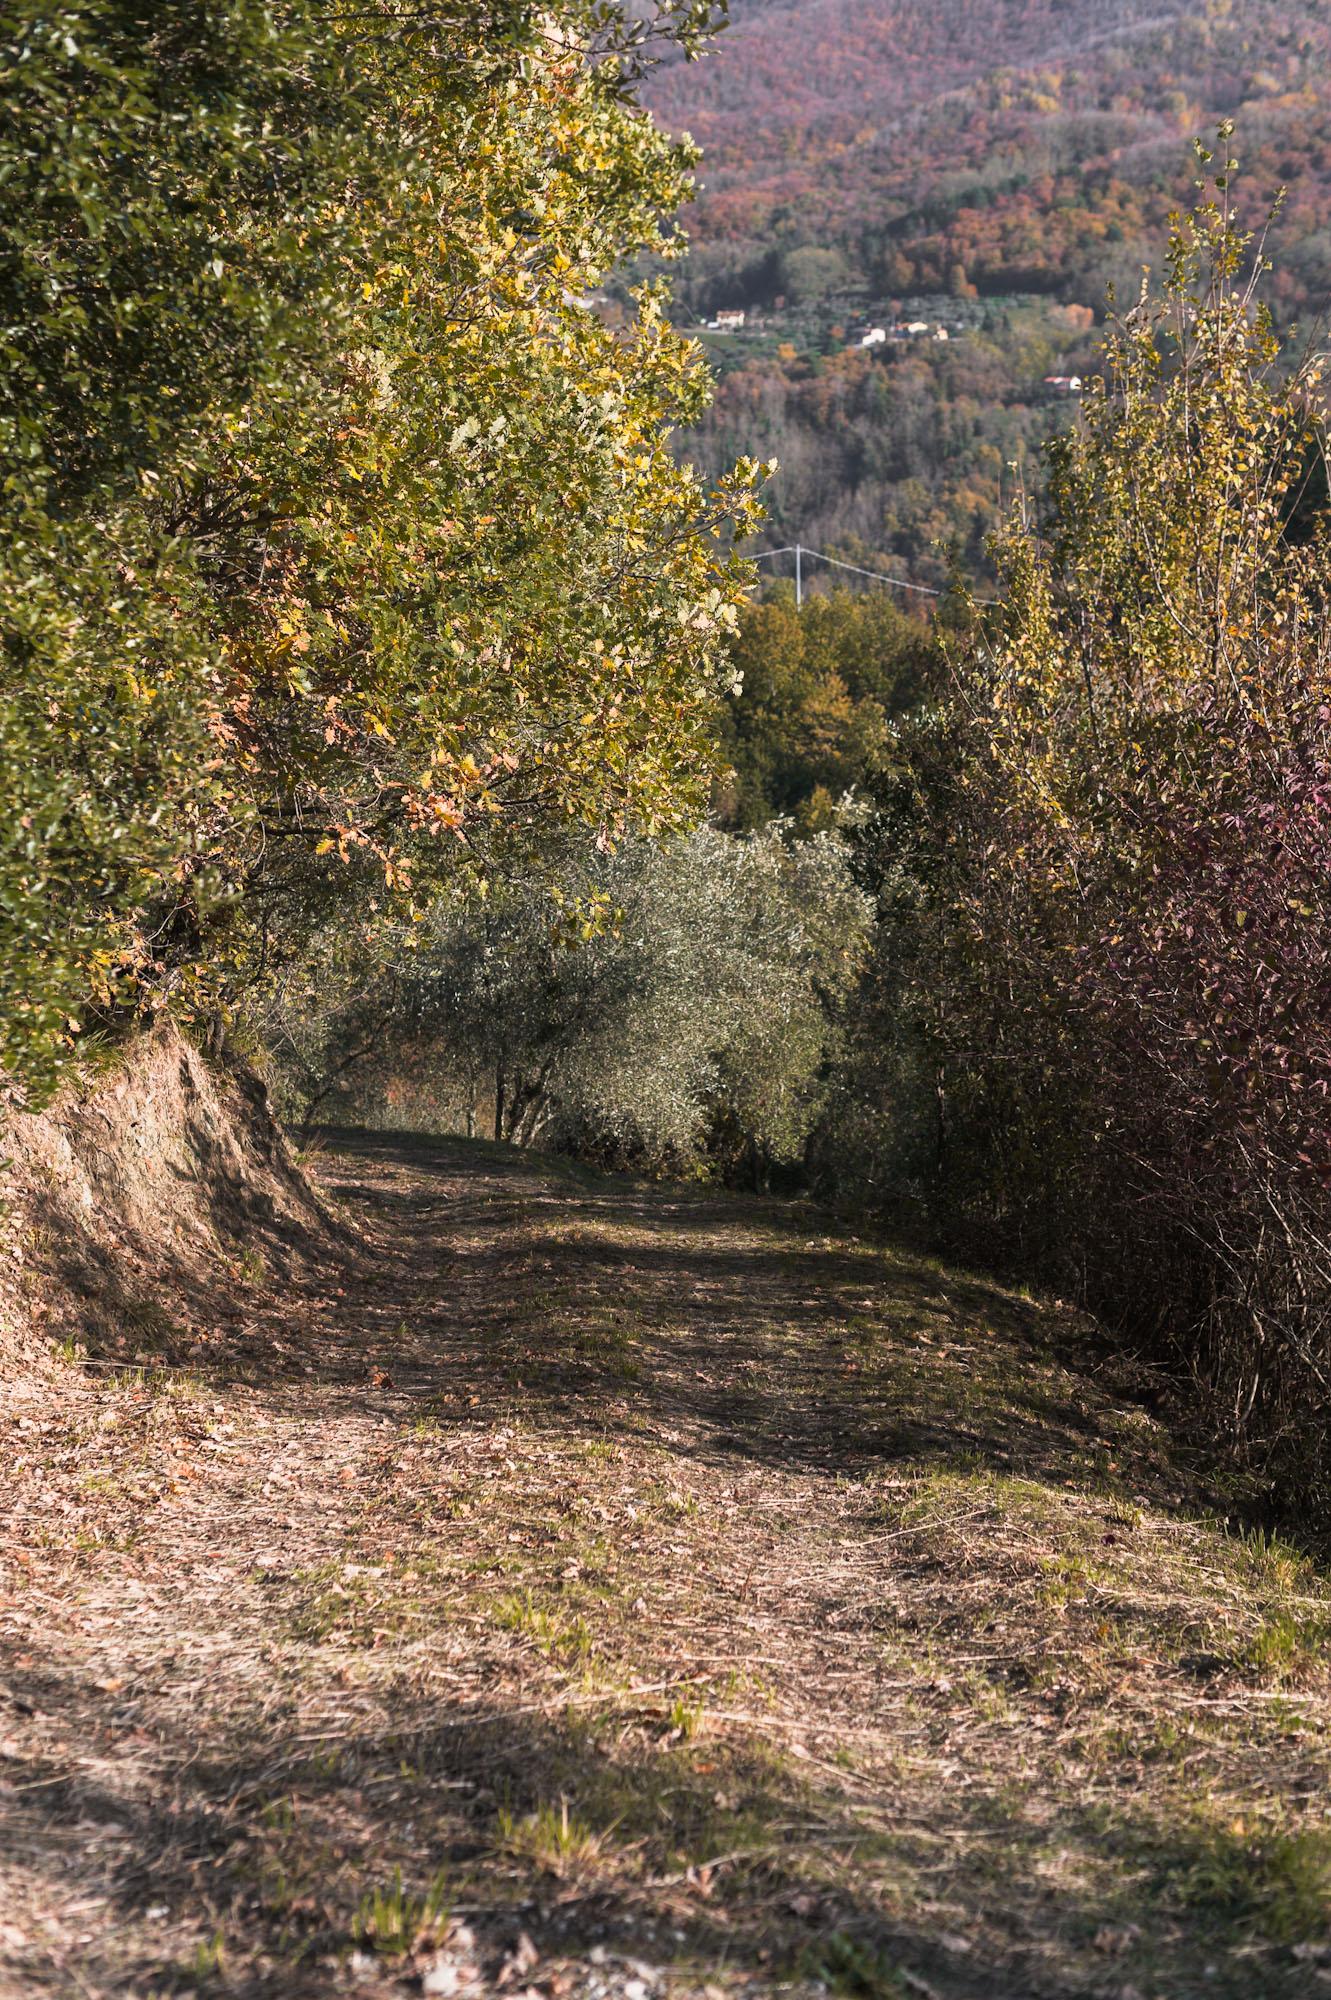 tuscany-19.jpg